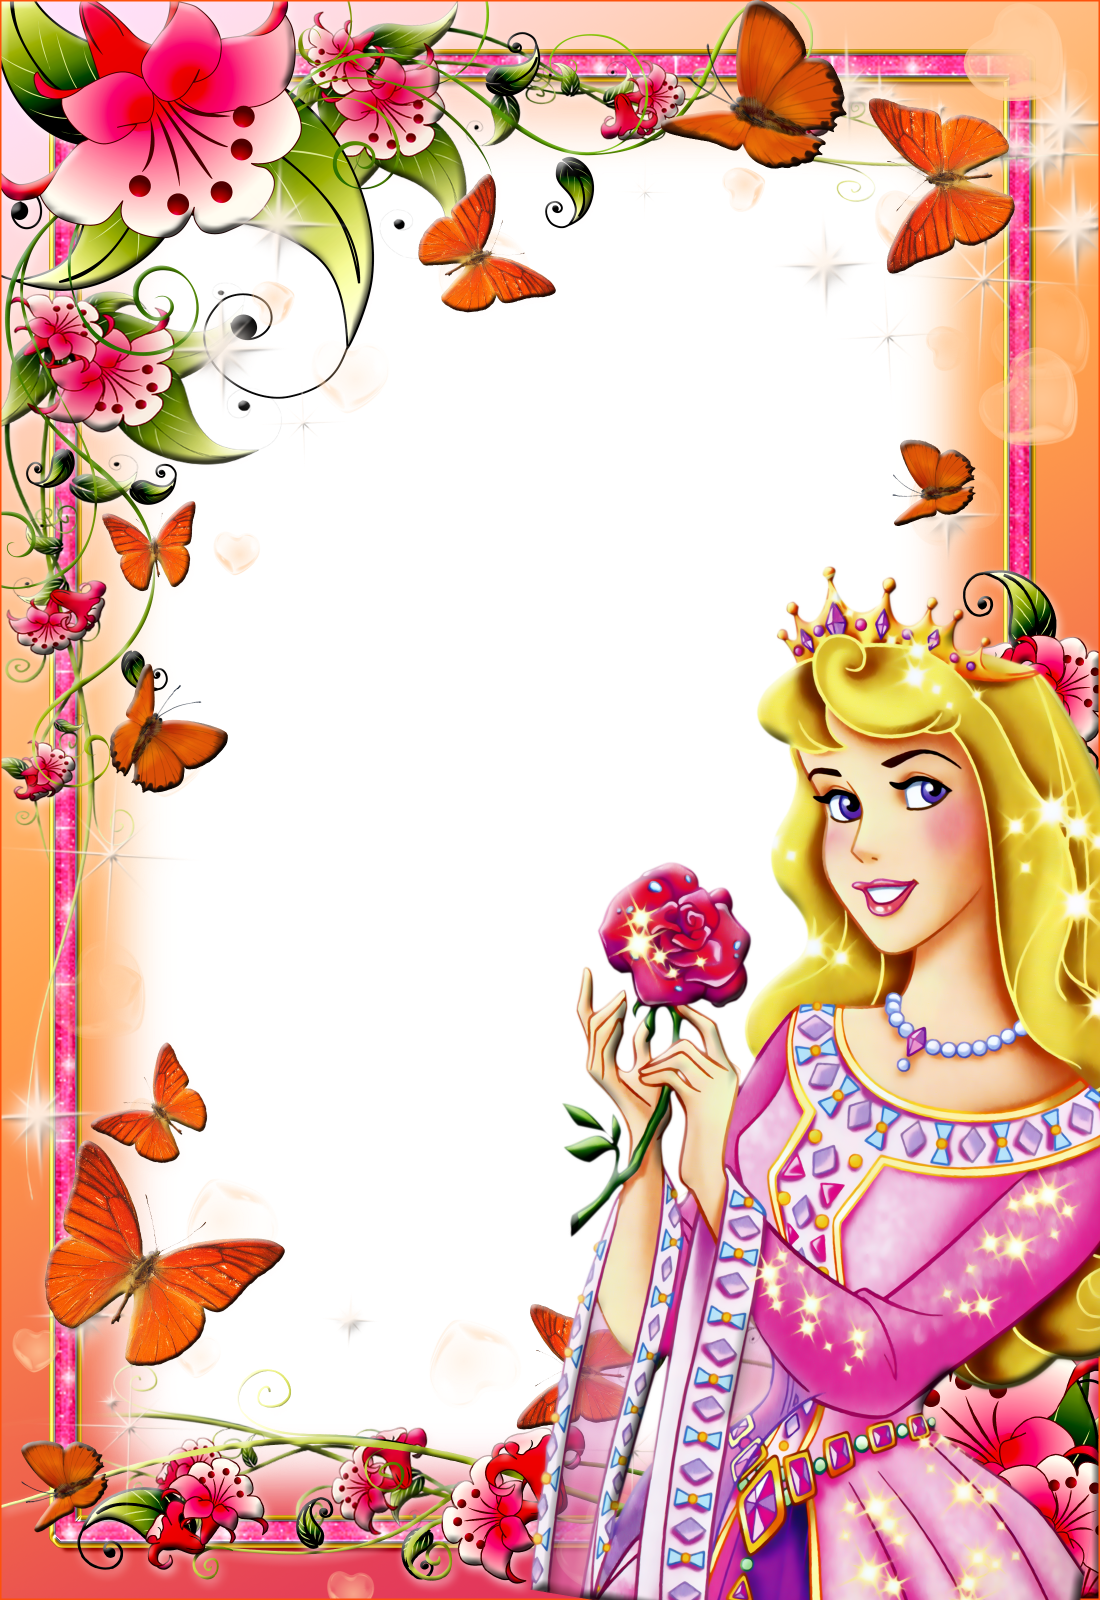 Photoshop clipart book picture free Imagens para photoshop: frames PNG fotos princesas disney #2   Paper ... picture free